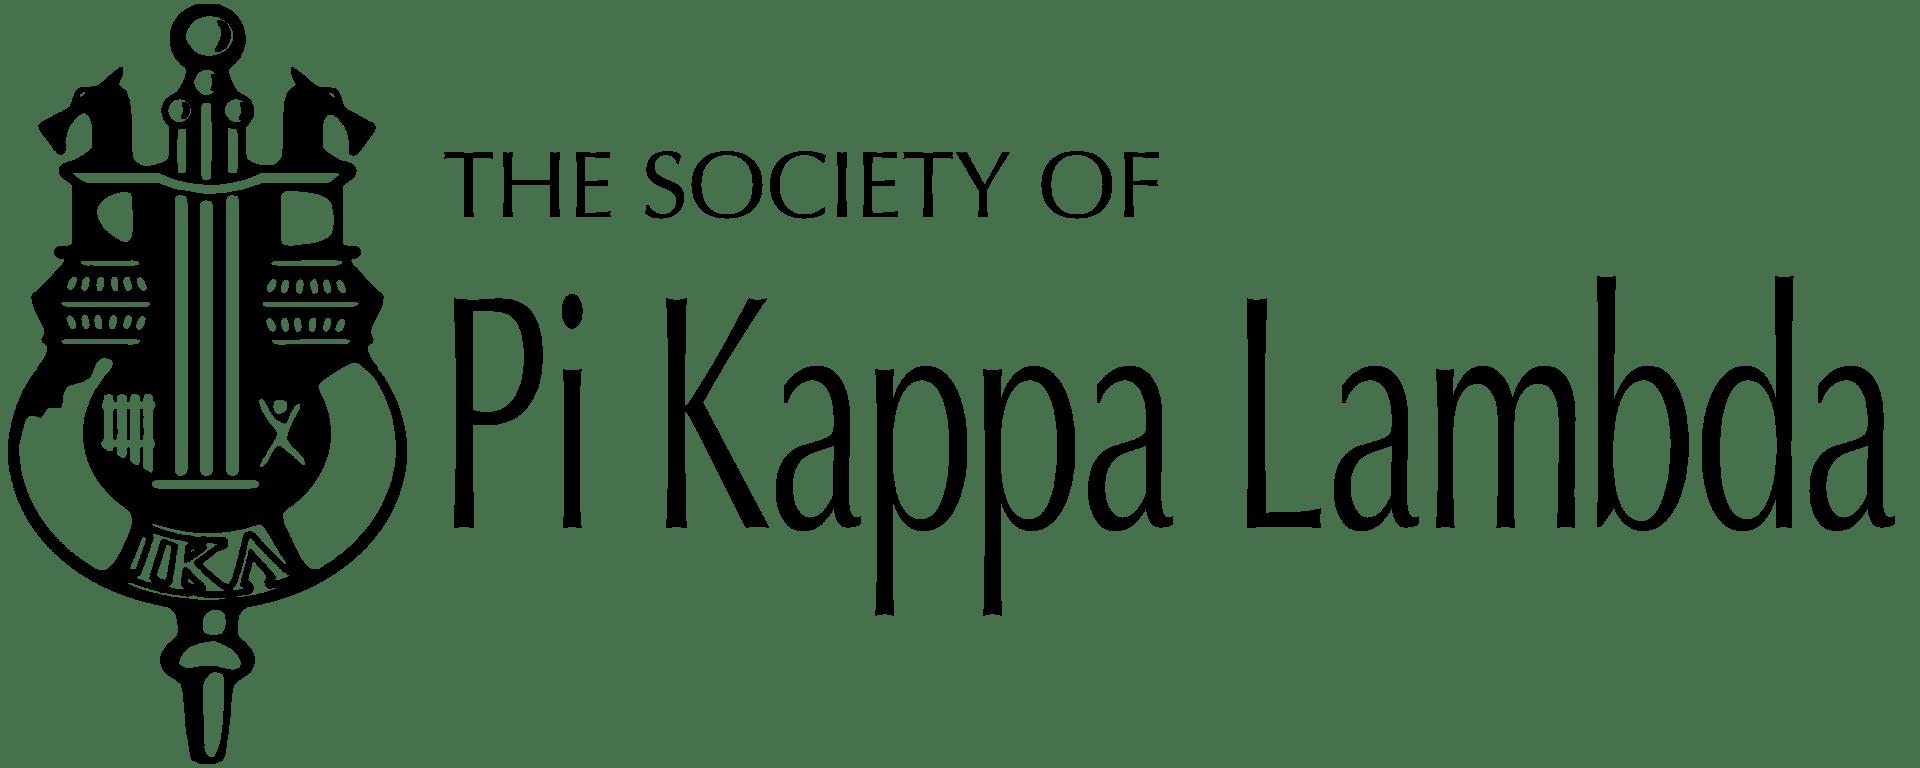 Pi Kappa Lambda crest